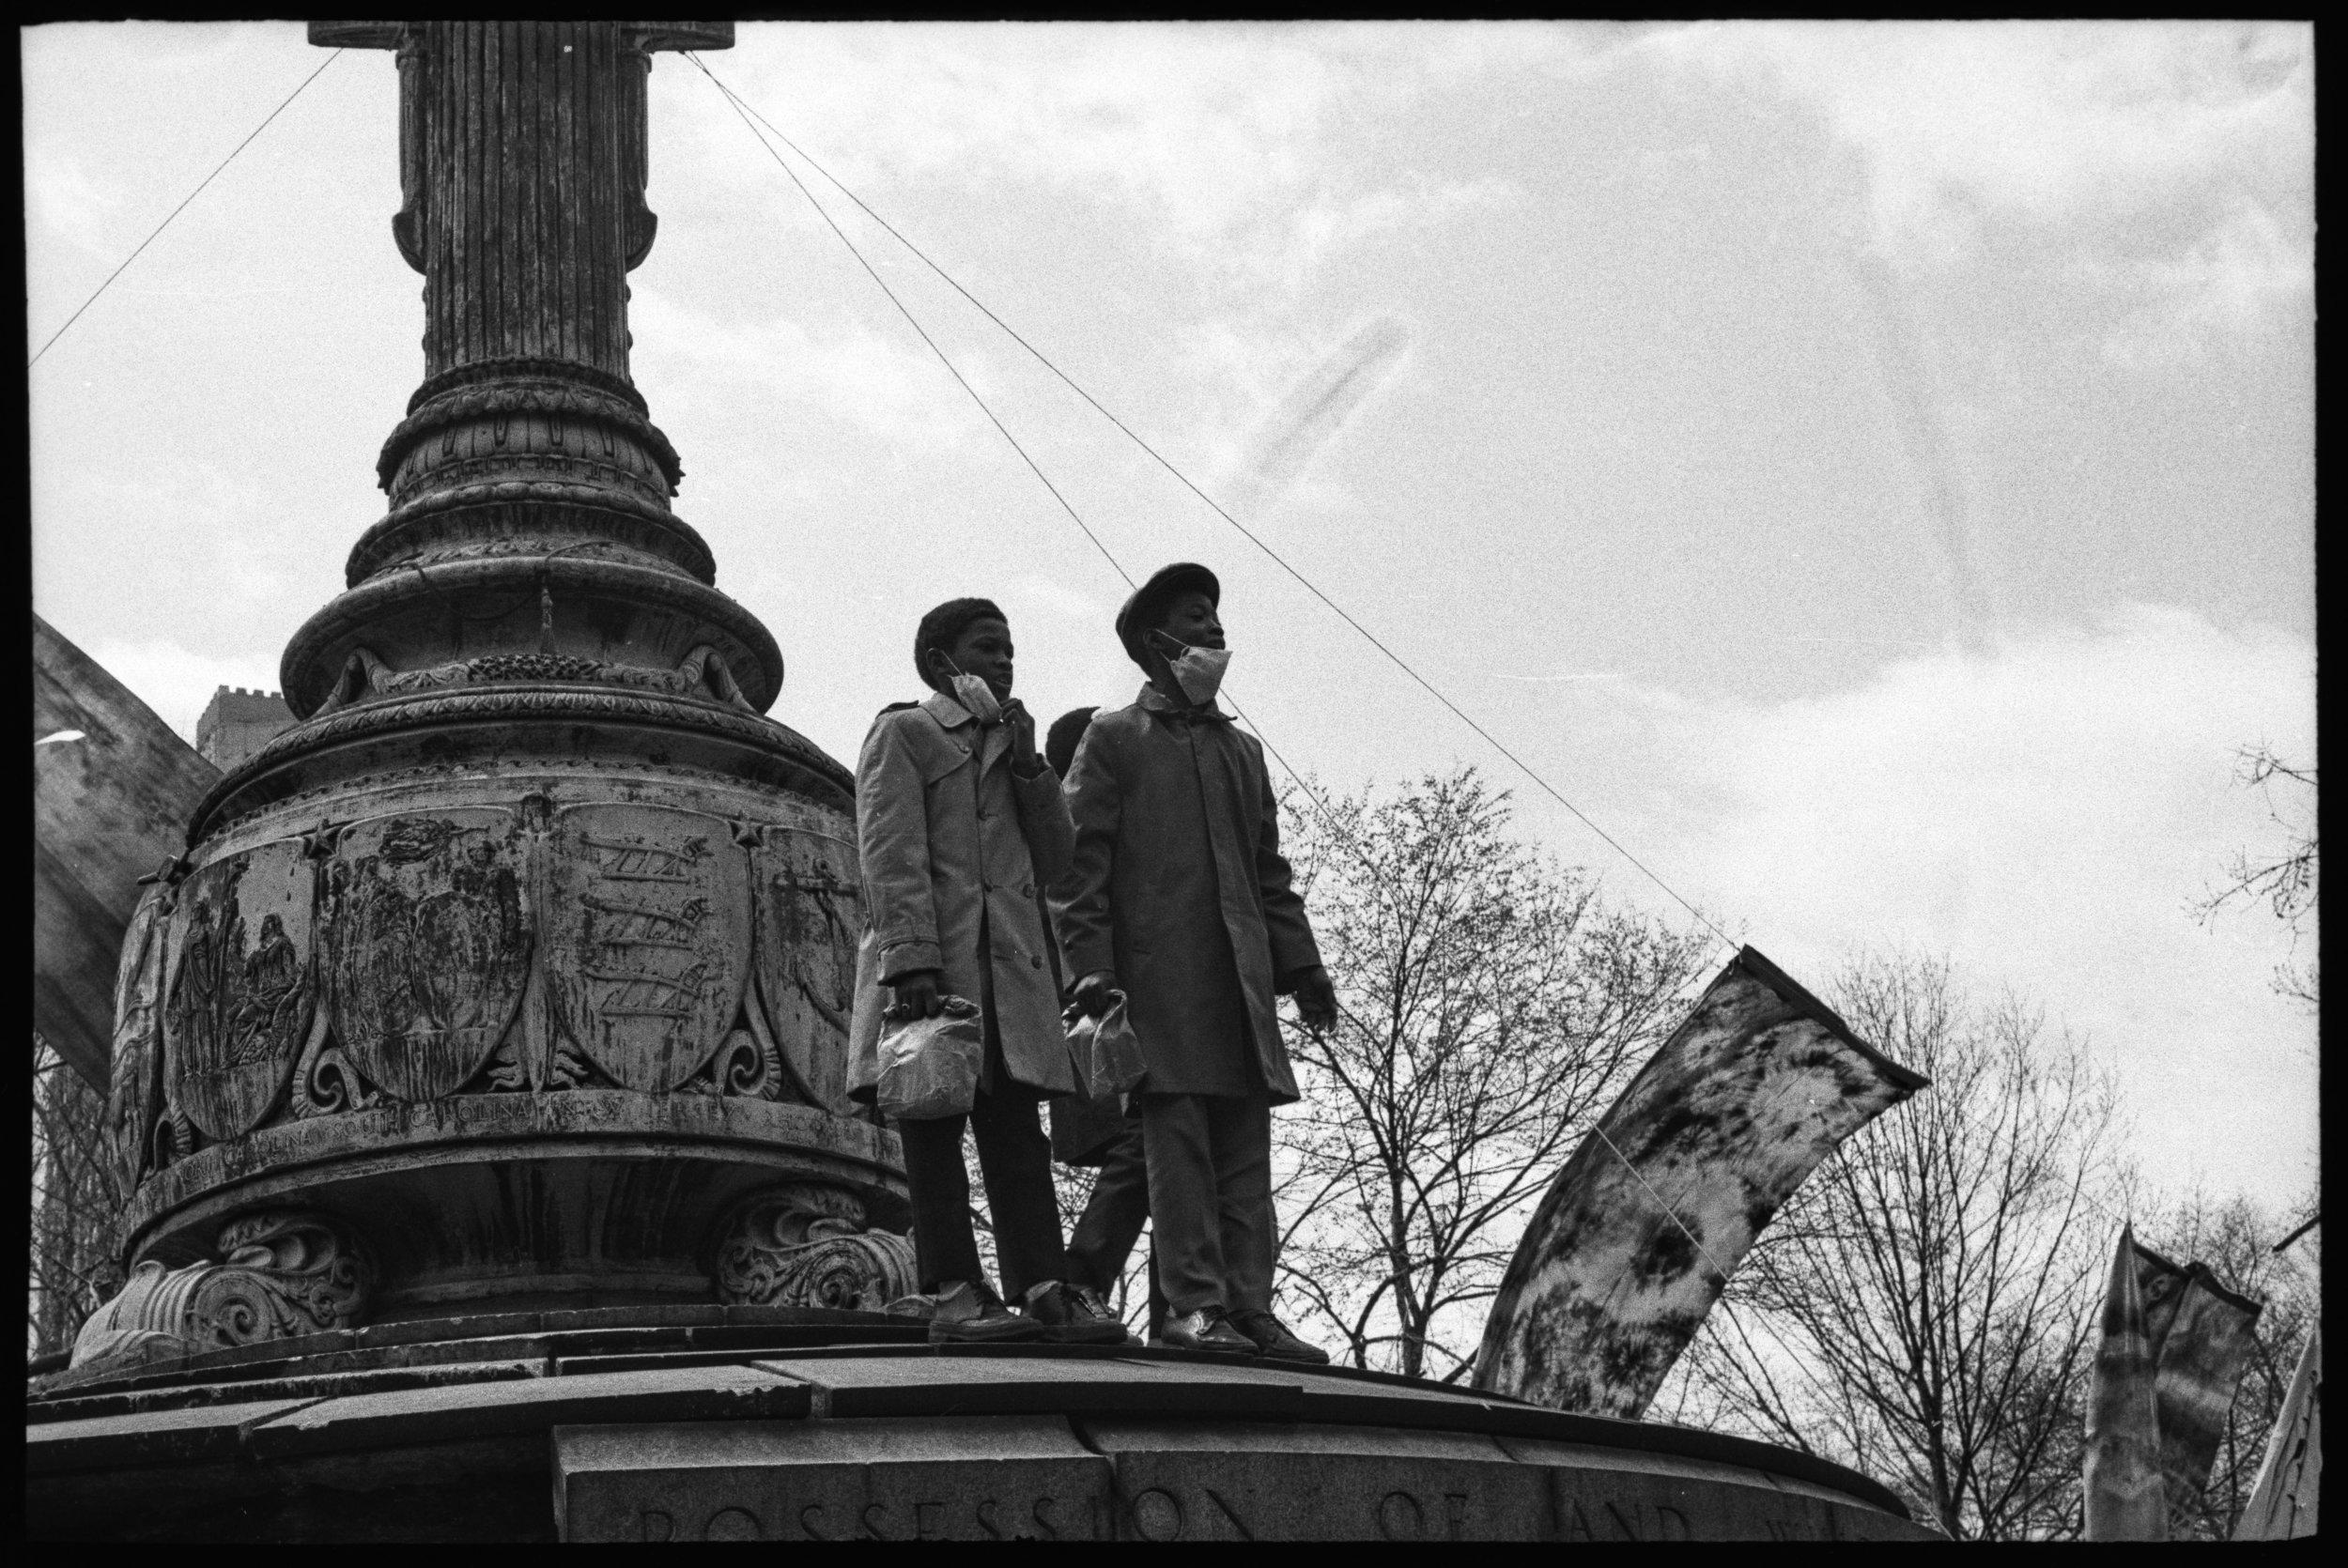 Boys on Independence Monument, Washington Square Park, April 22, 1970